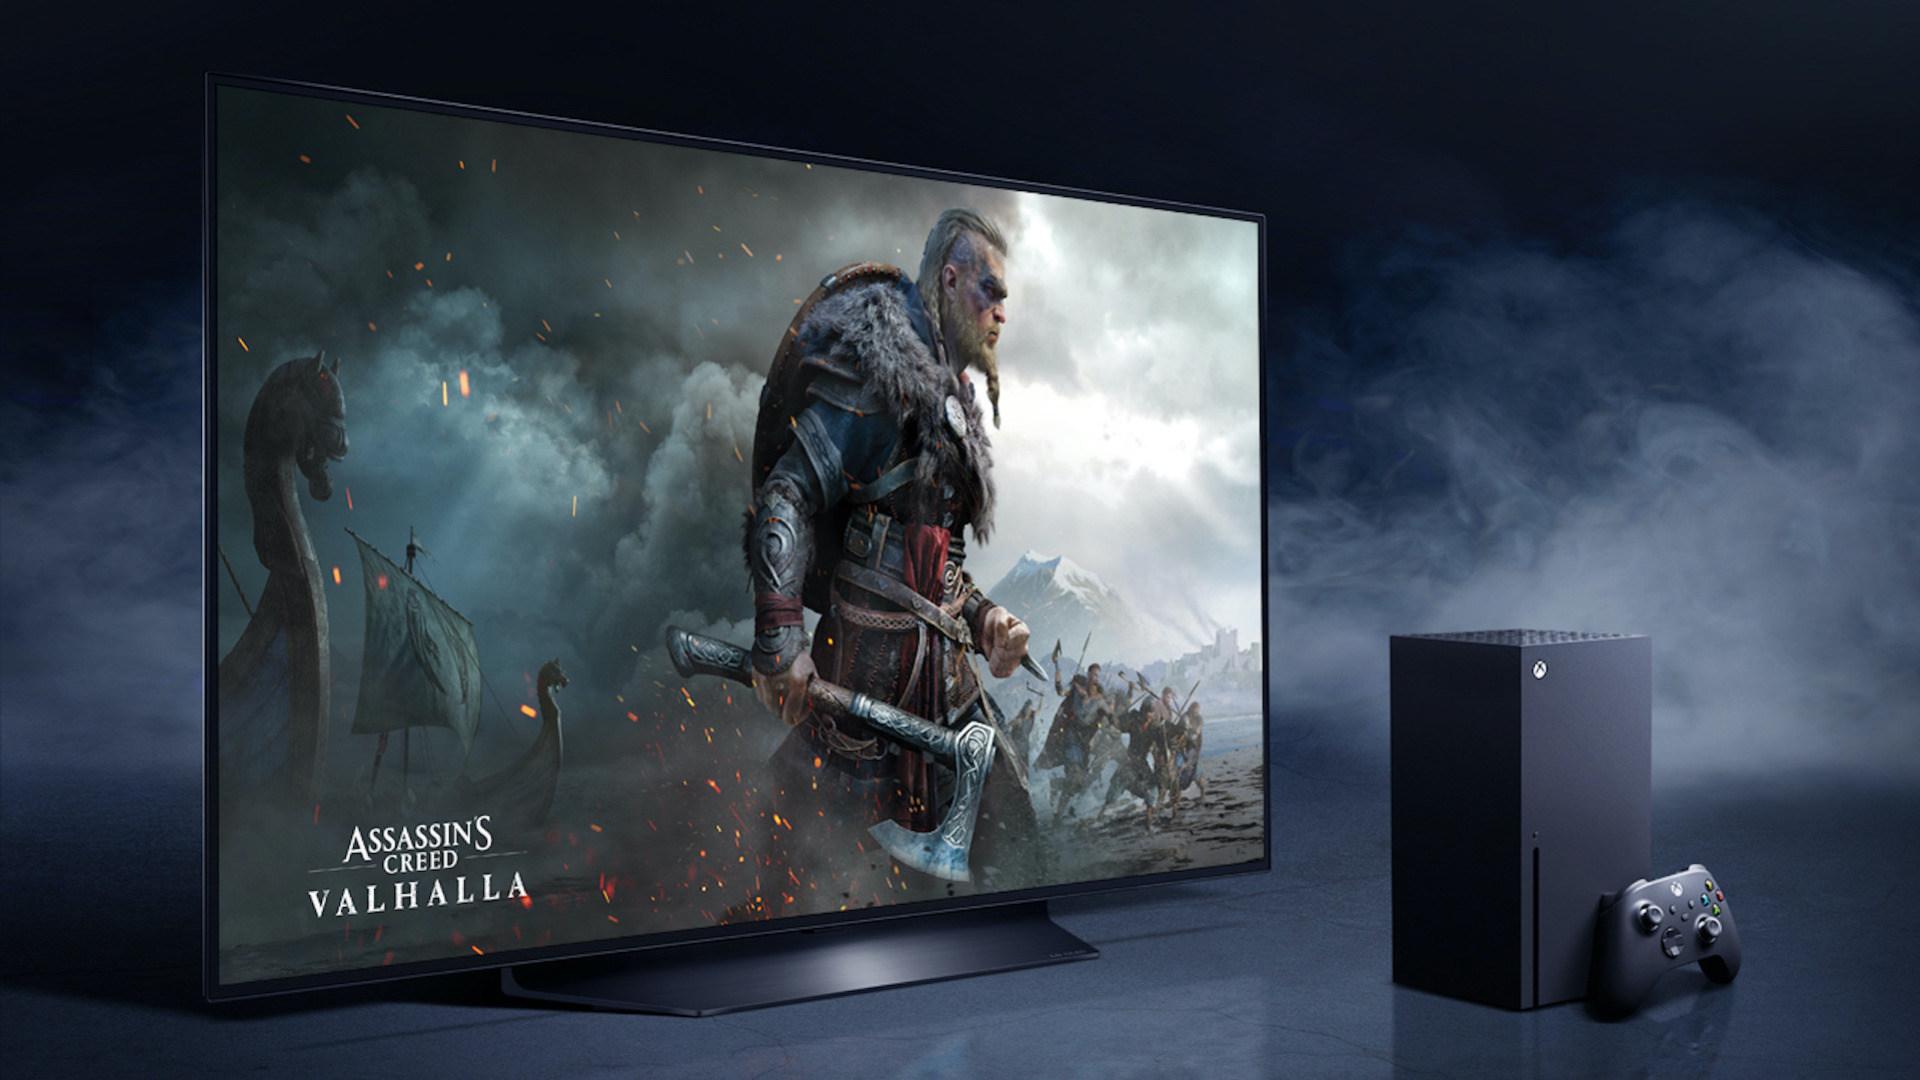 Konsole, Fernseher, Xbox Series X, Partner, LG OLED